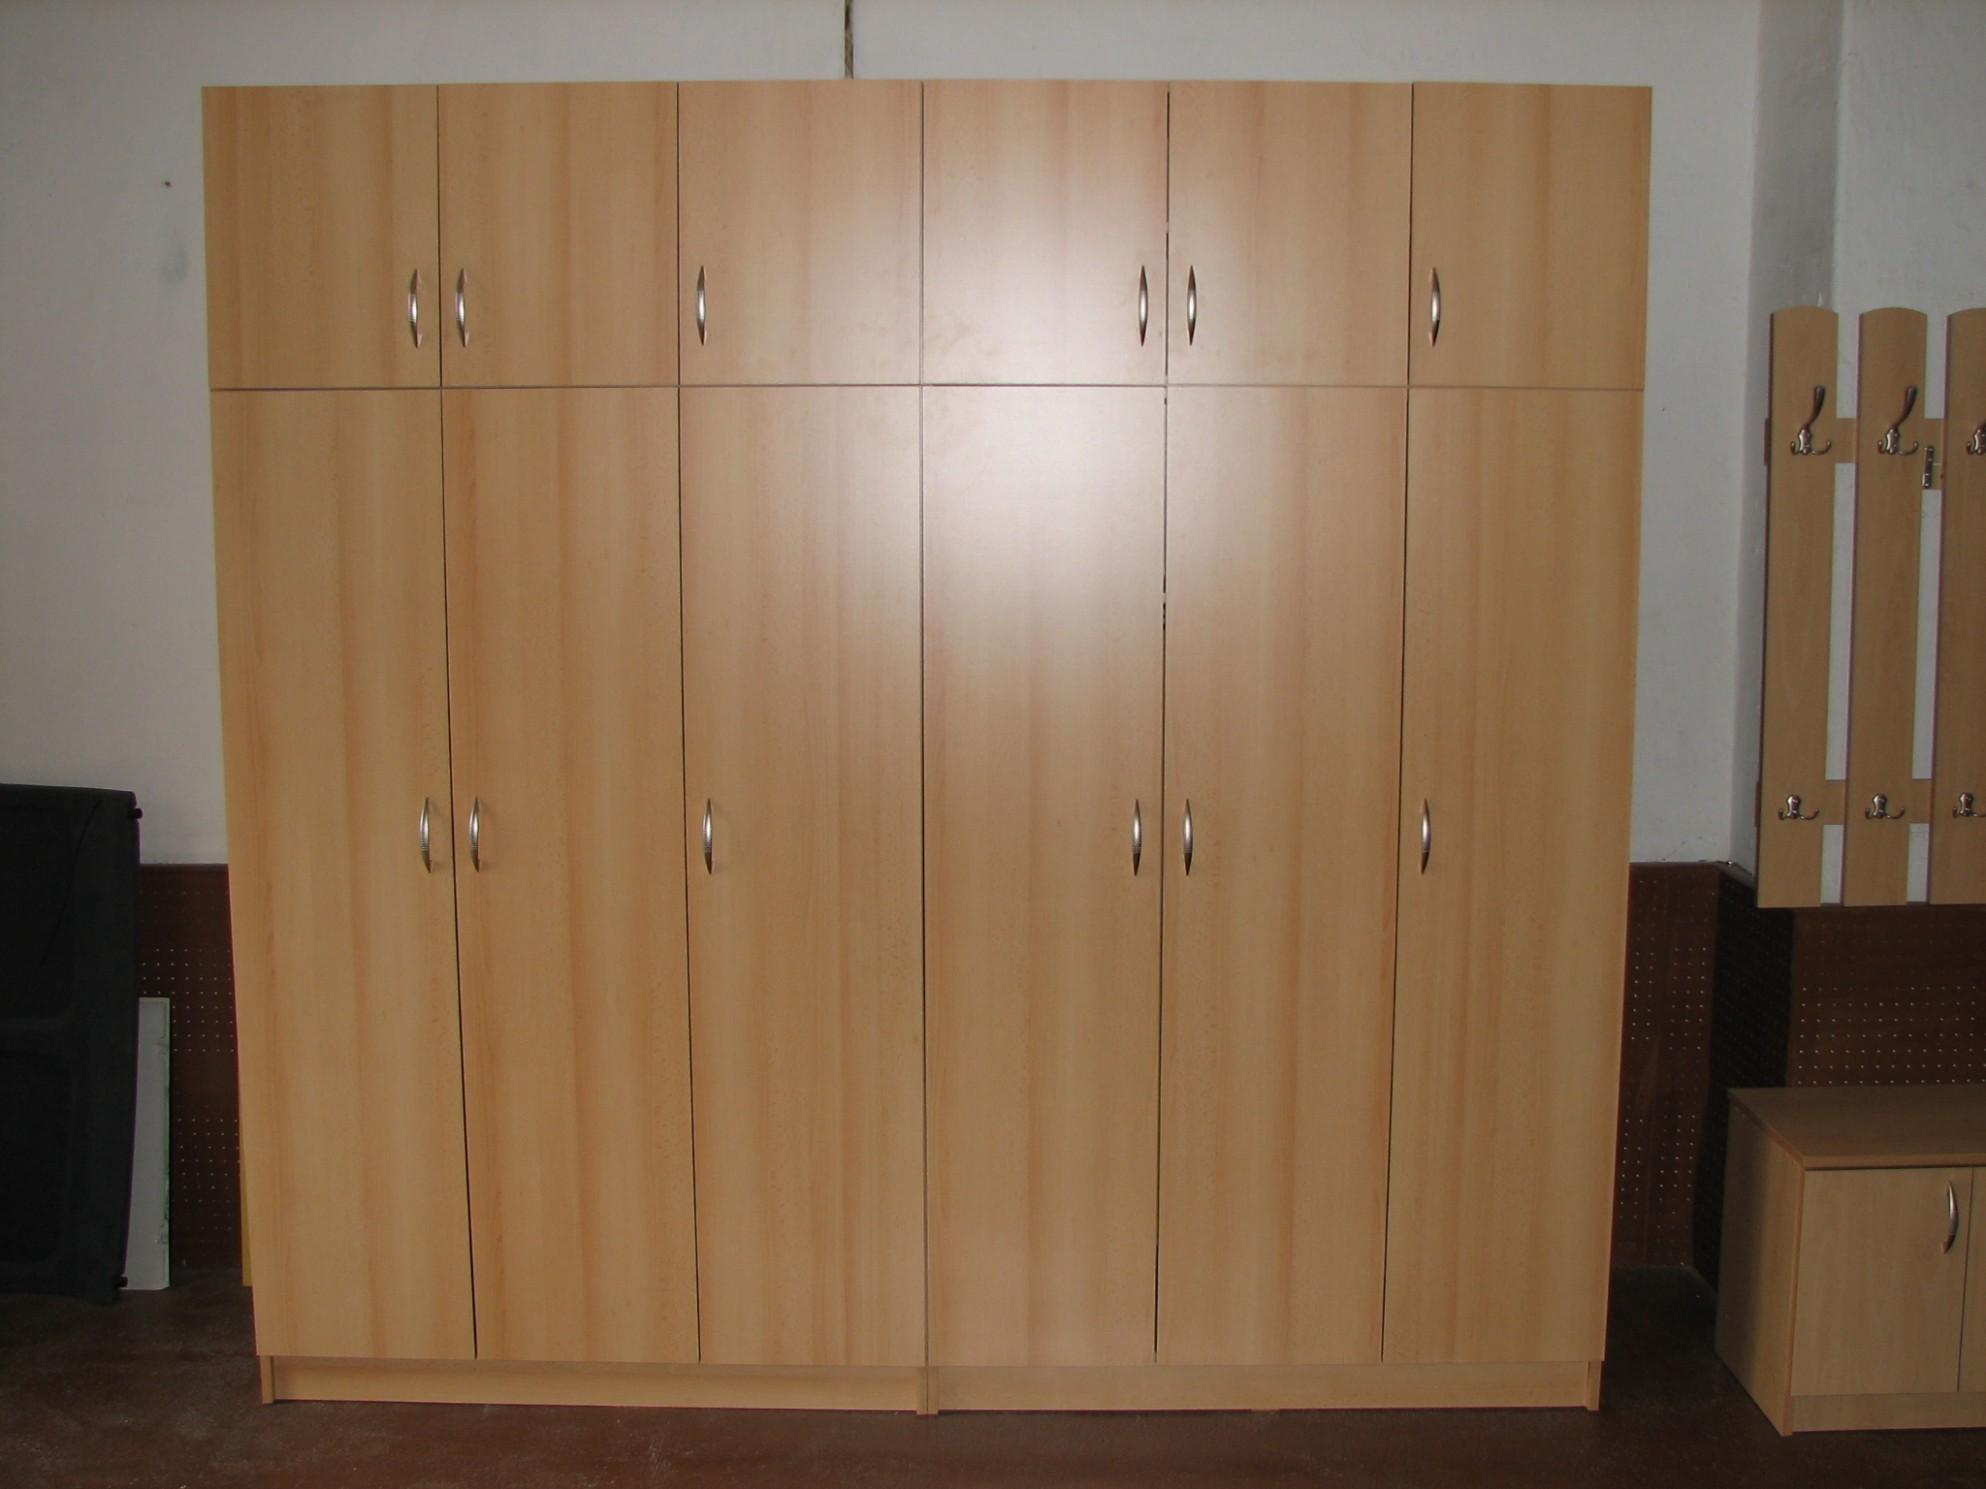 Nábytek Bohumil Říha | Výroba nábytku na zakázku